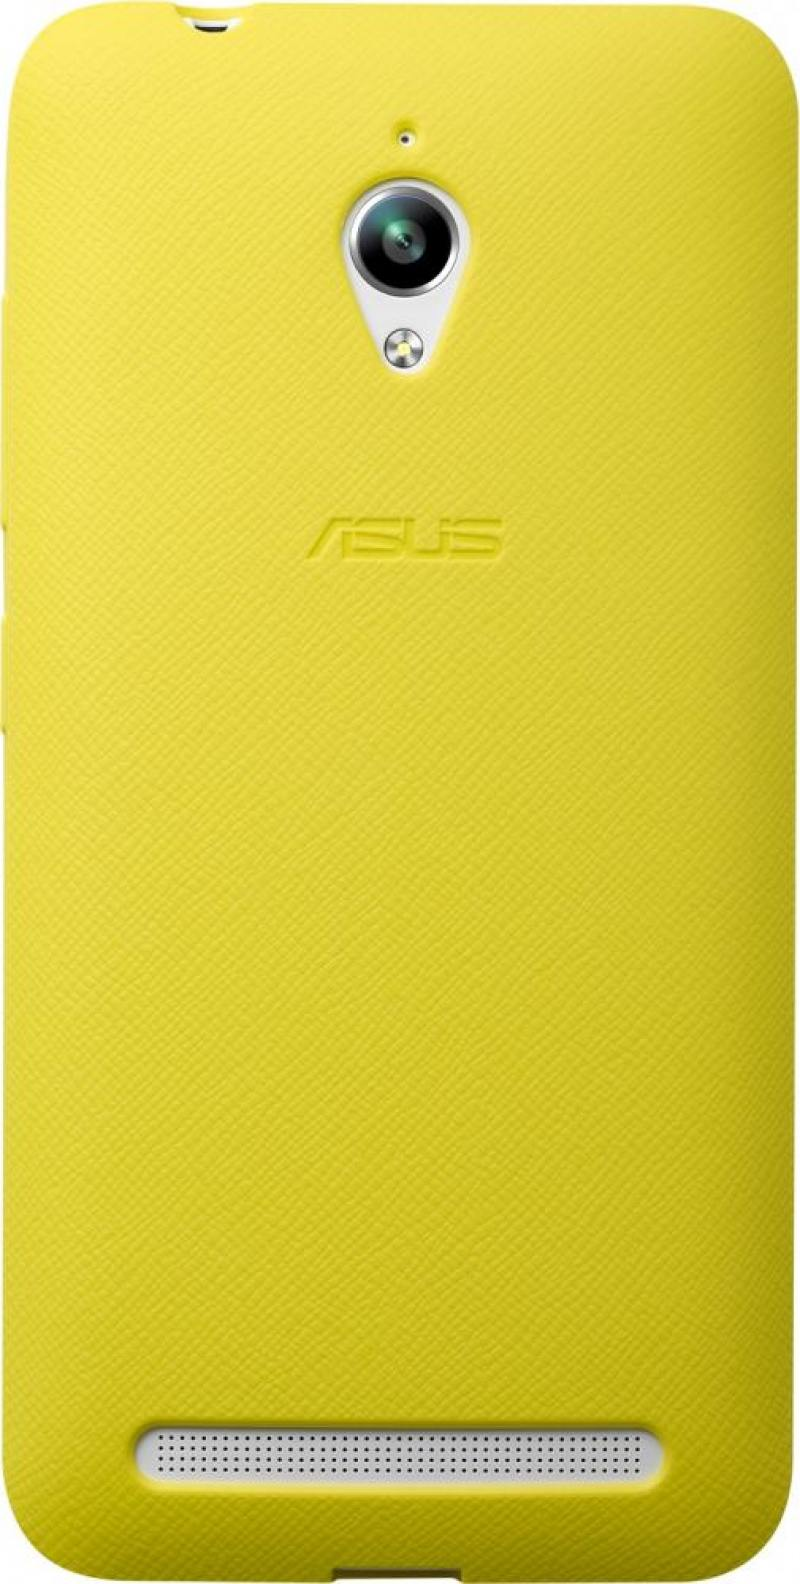 все цены на Задняя крышка Asus для ZenFone GO ZC500TG PF-01 BUMPER CASE желтый 90XB00RA-BSL3Q0 онлайн